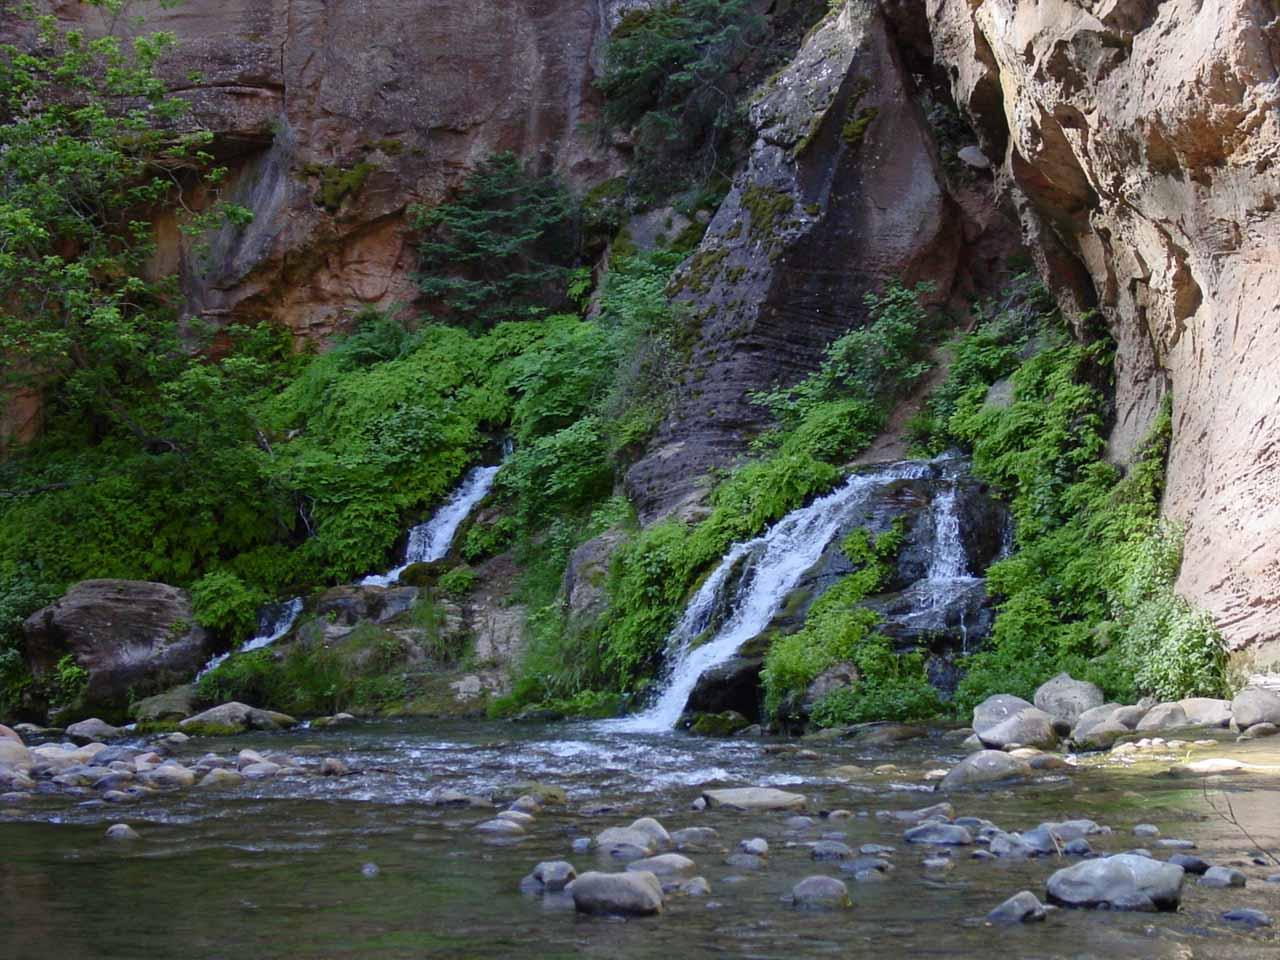 Zion Narrows Waterfalls Zion National Park Utah USA